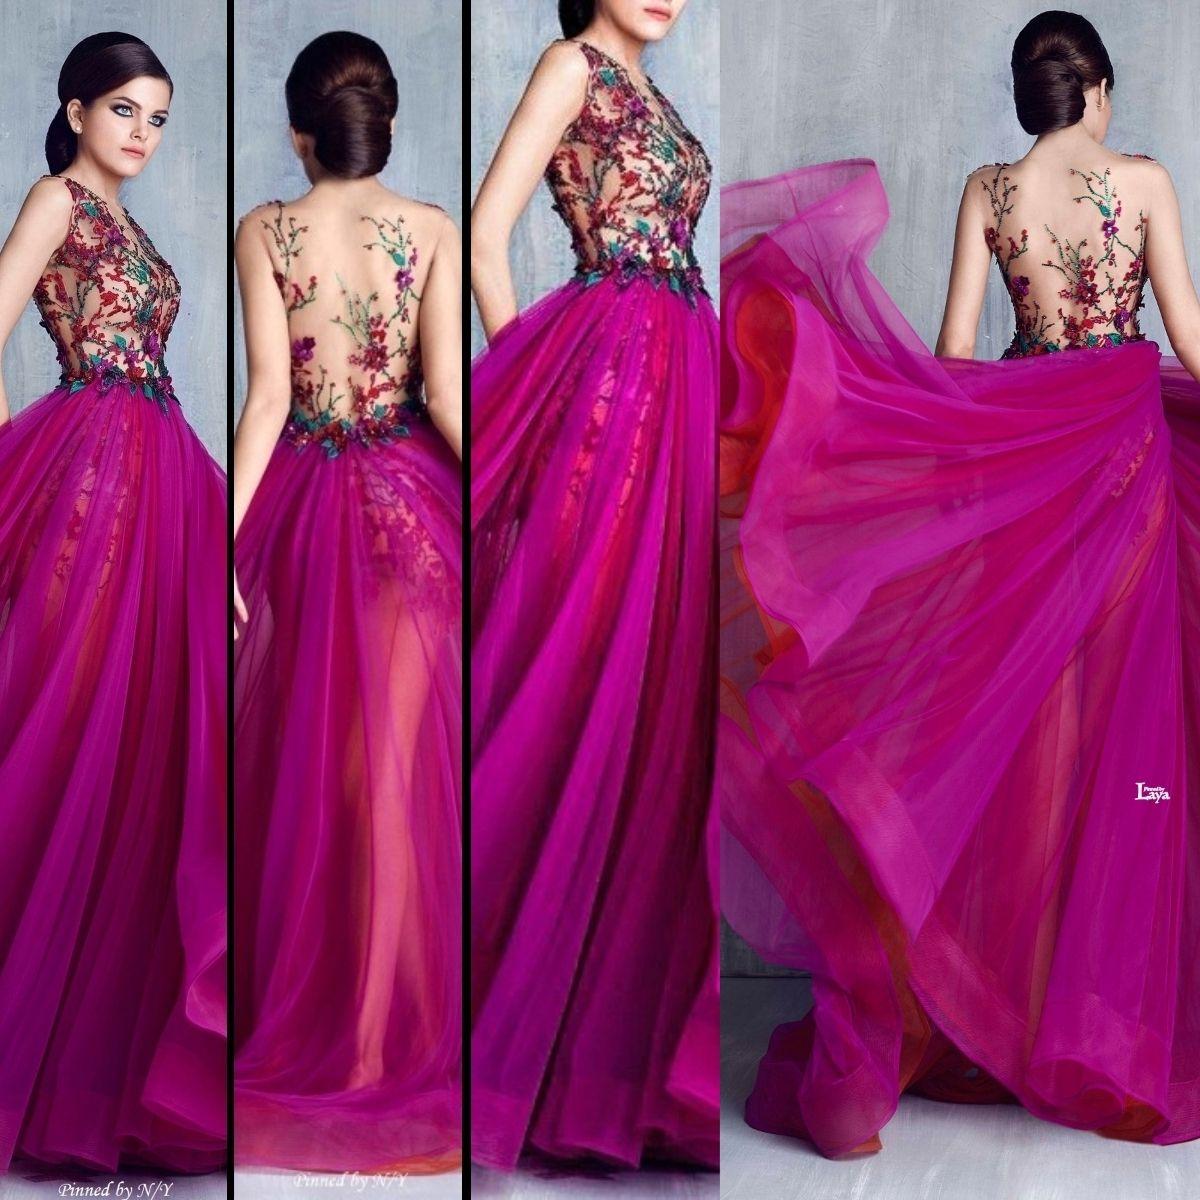 Pin de Teresa Nuñez en EXPRESSION DESING | Pinterest | Vestiditos ...